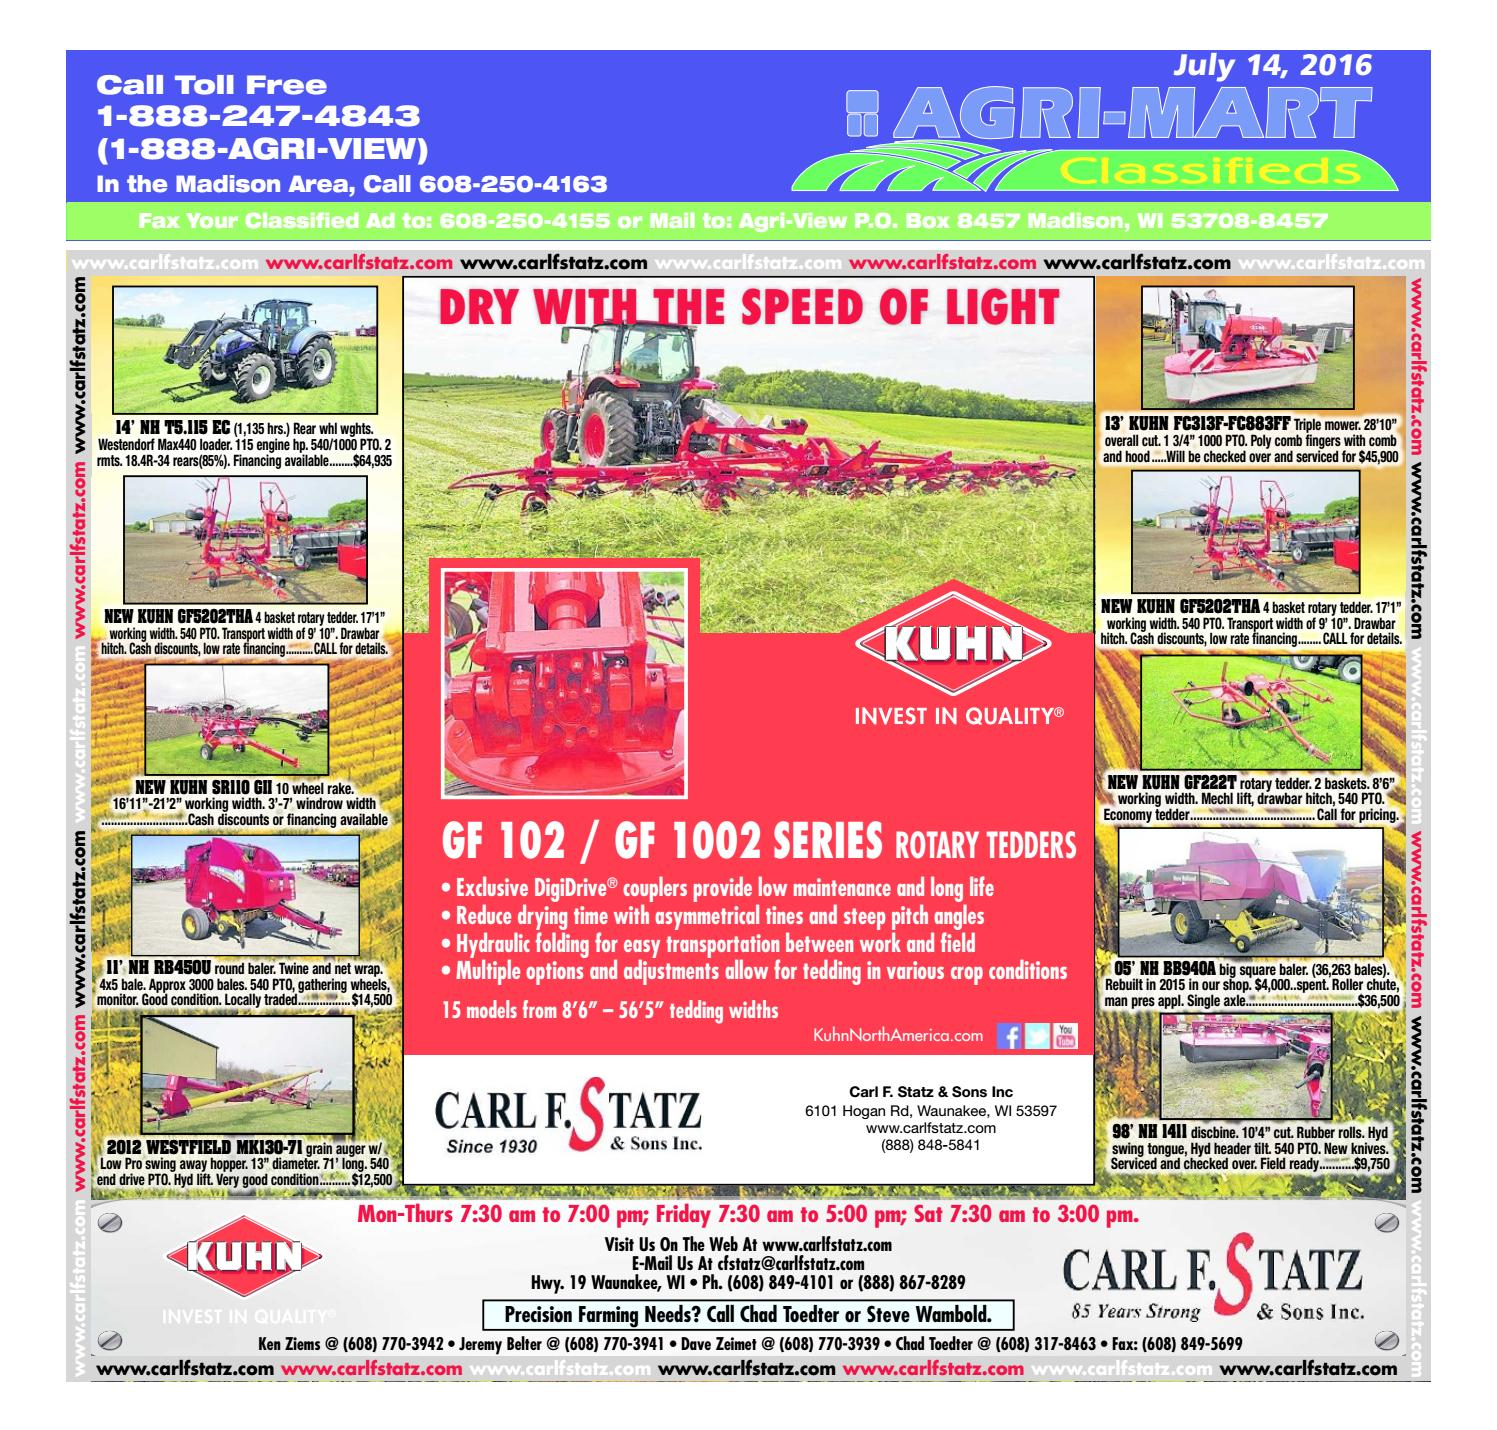 July 14, 2016 Agri-Mart by Madison com - issuu